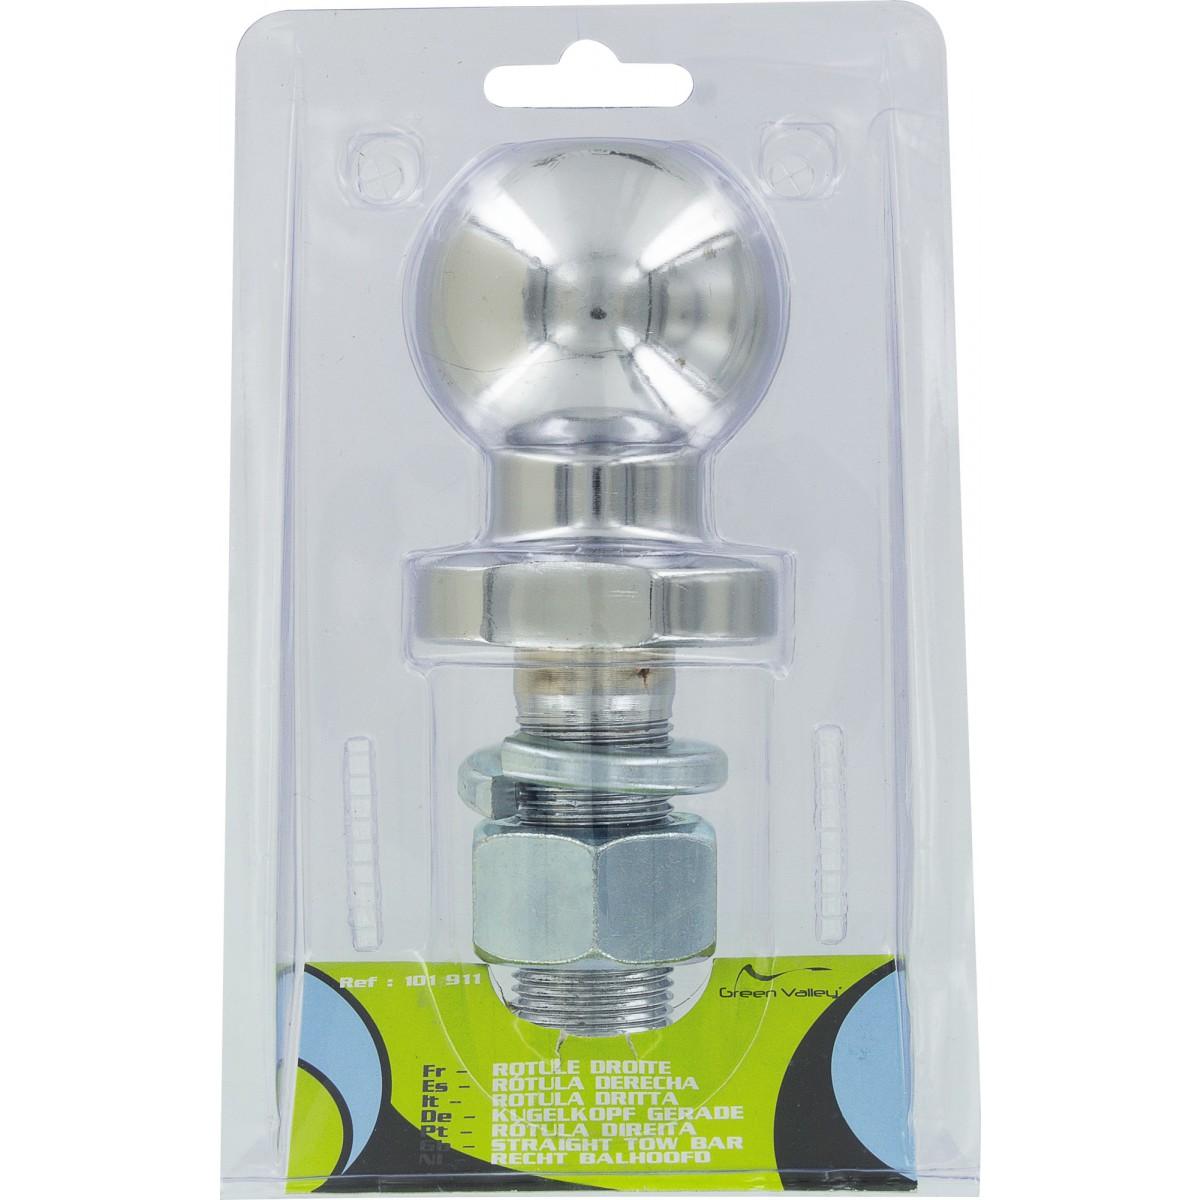 Remorquage rotule droite Flauraud - Diamètre boule 50 mm